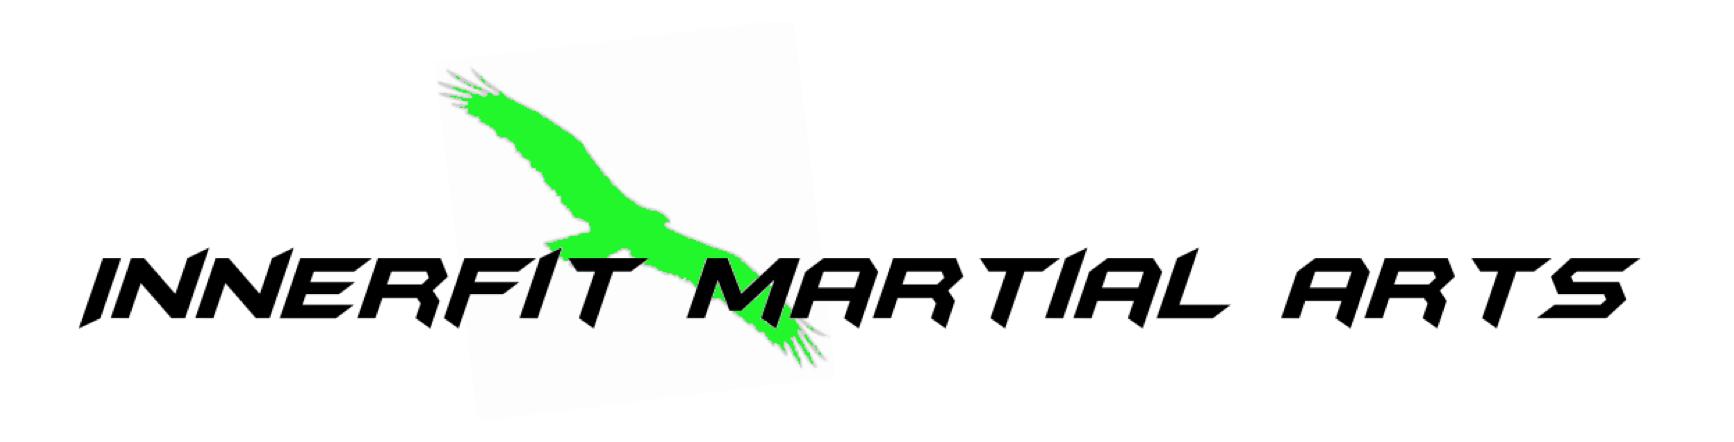 Innerfit Martial Arts Logo